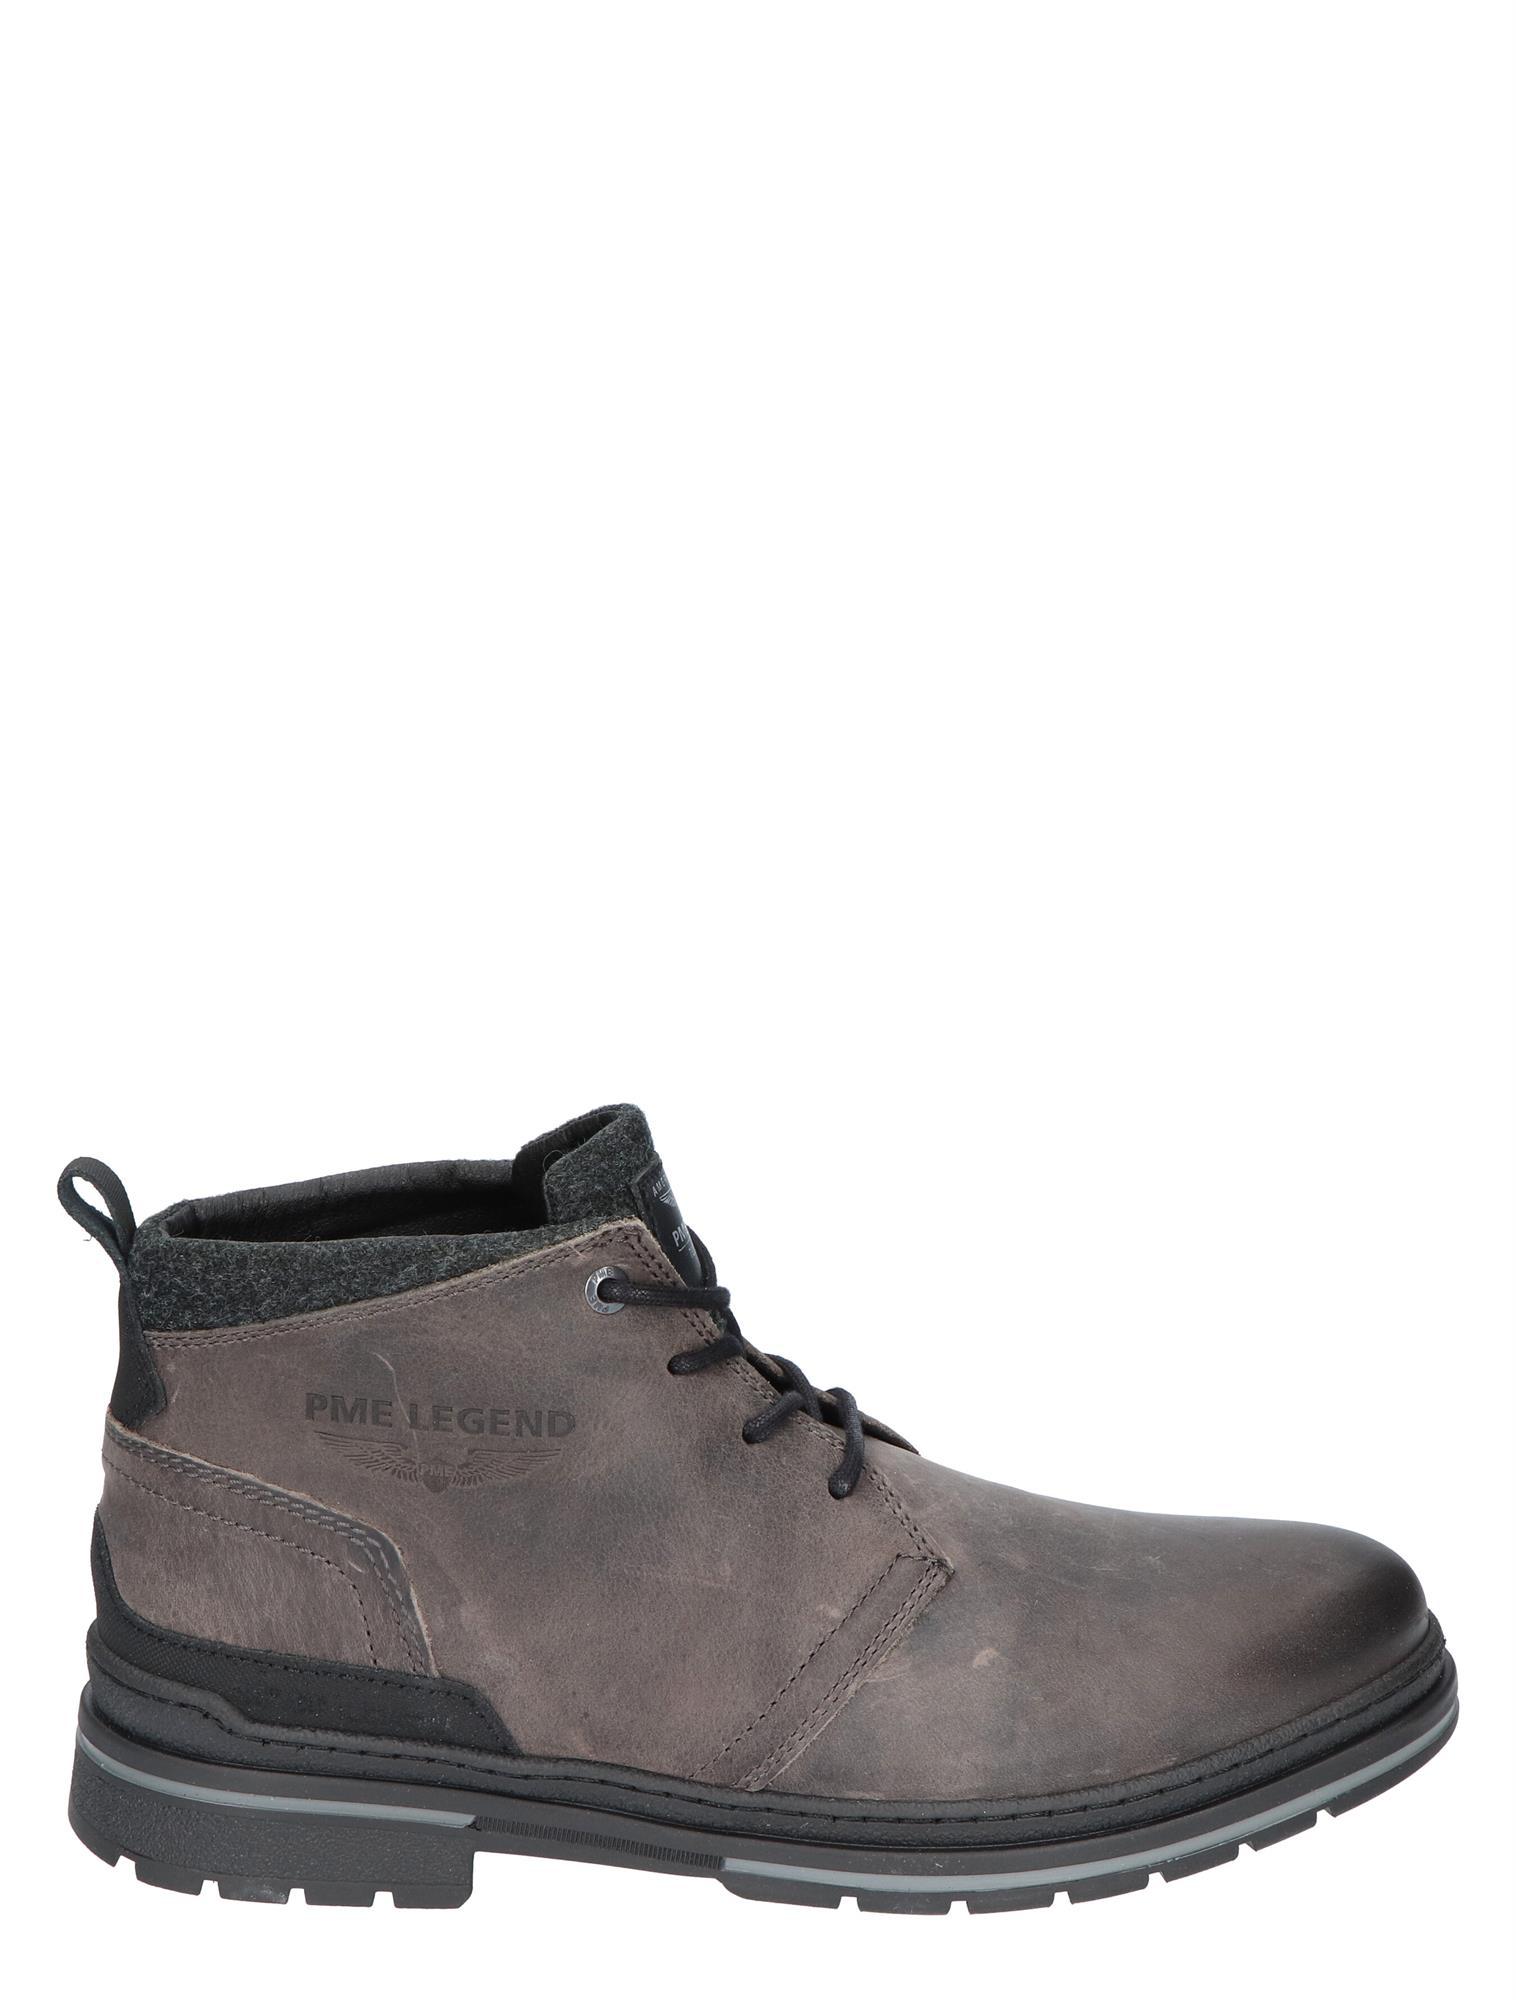 Pme Legend Fleetman PBO206028 961 Grey Veter Boots Boots